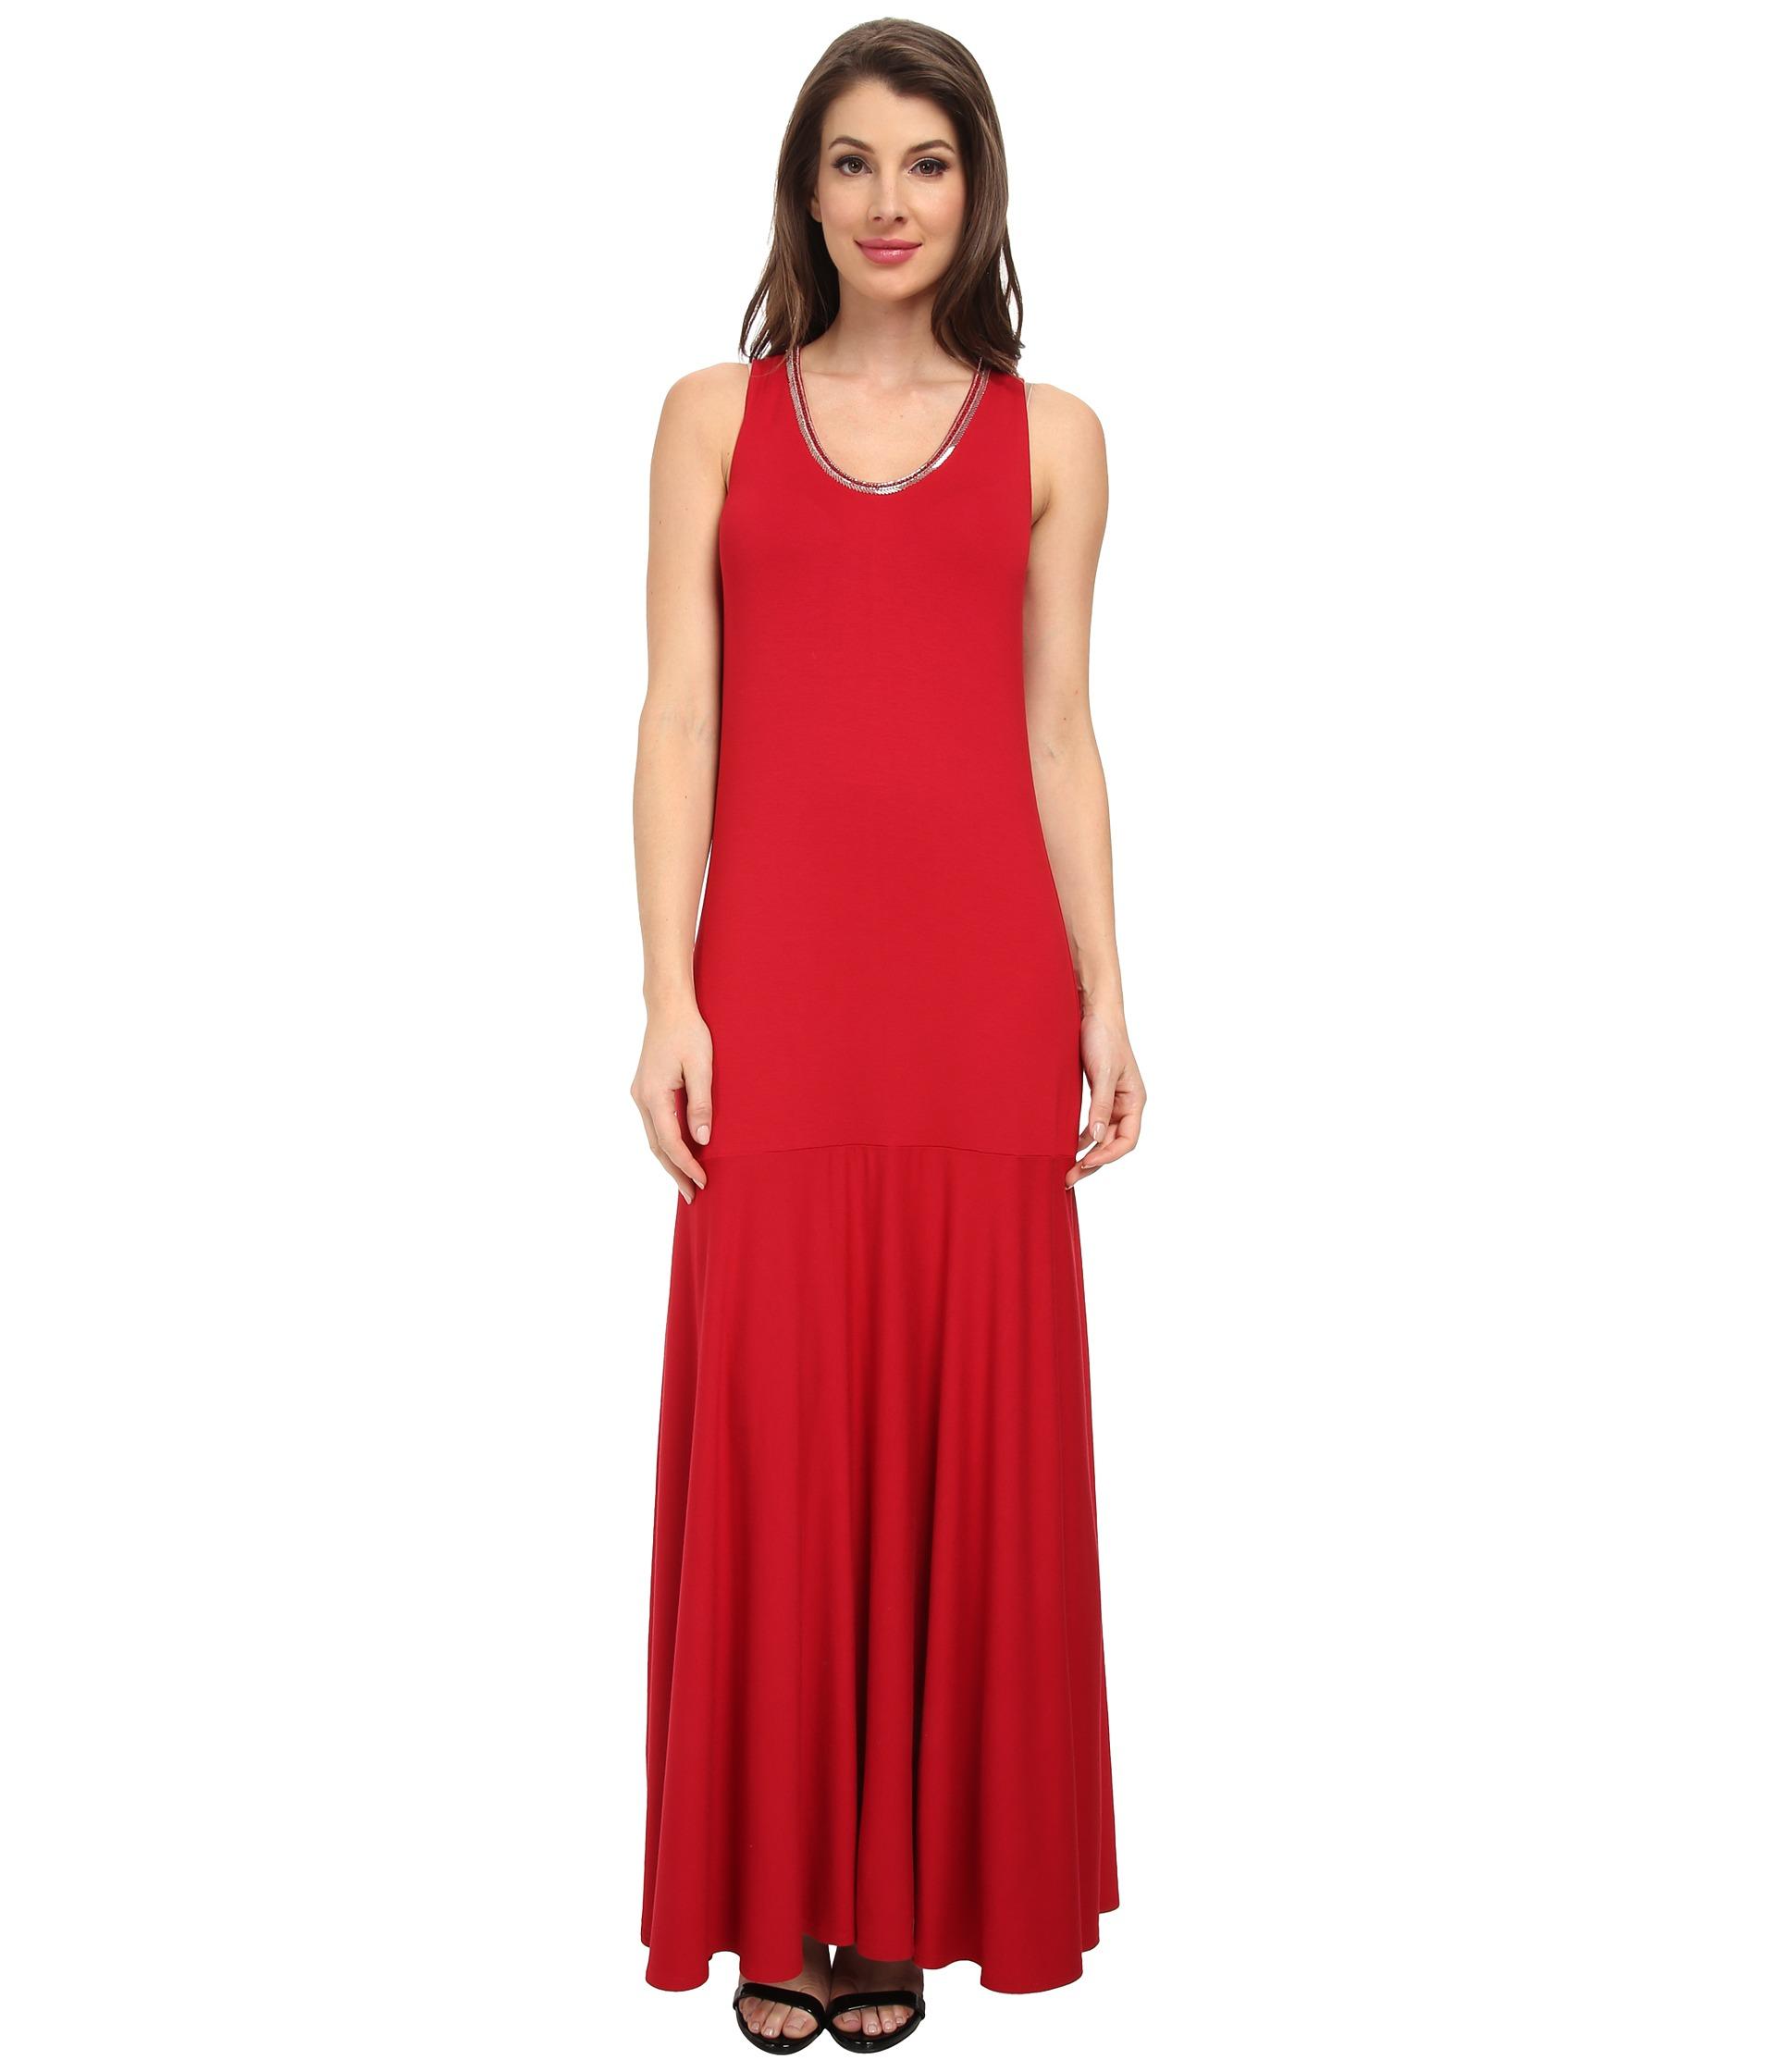 Tommy Bahama Gower Jersey Long Dress